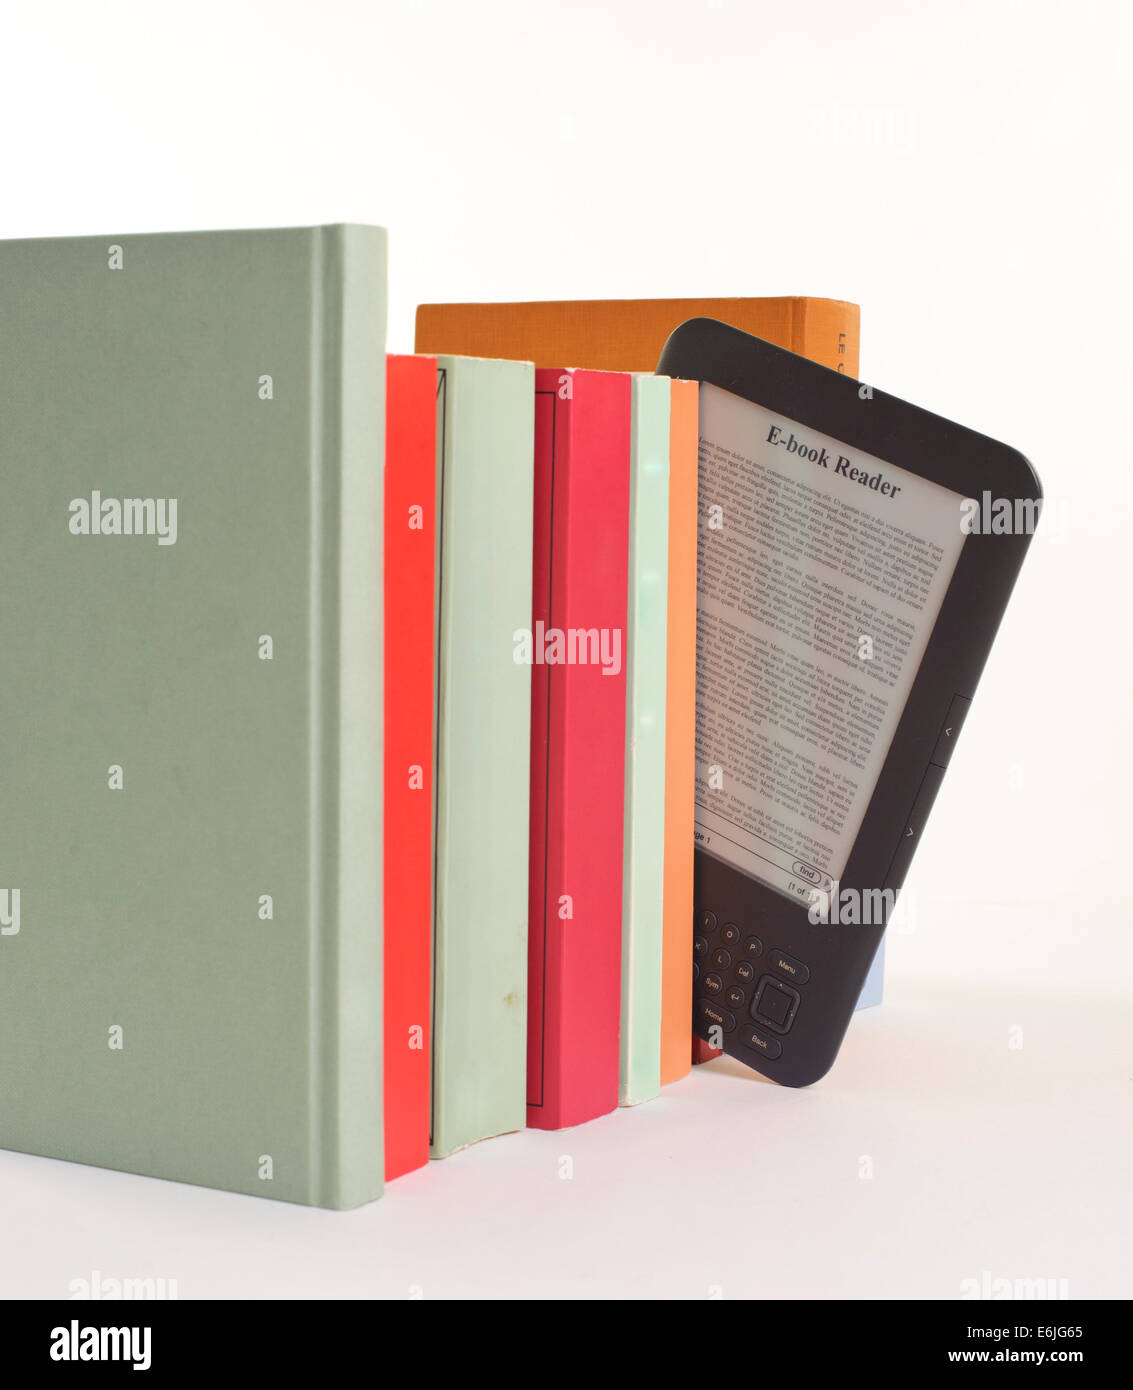 Ebook reader - Stock Image